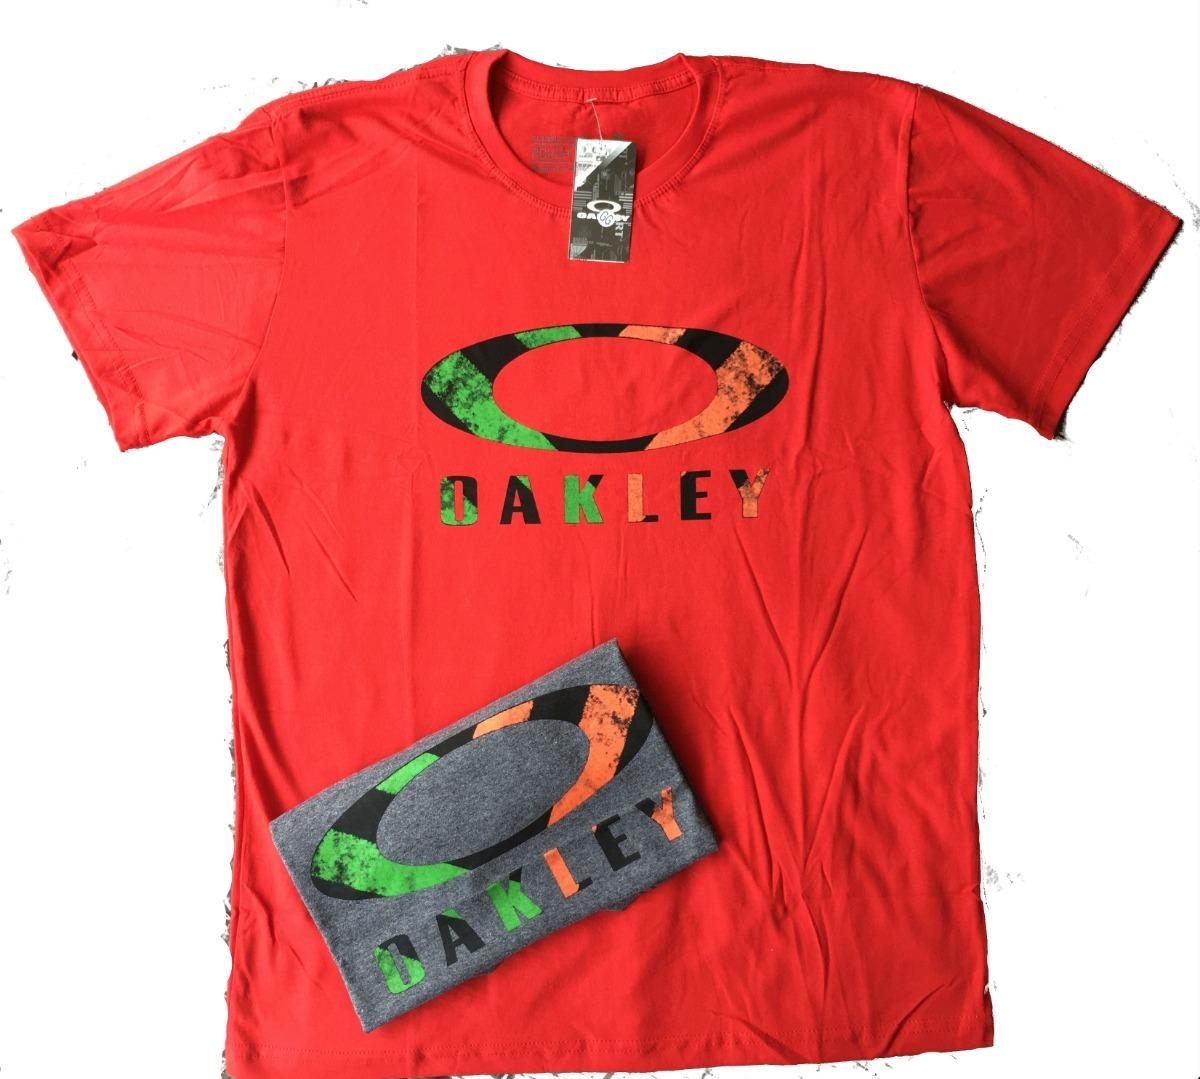 e2caa95bcd promoção kit lote 5 camisa camiseta oakley masculina 2019. Carregando zoom.